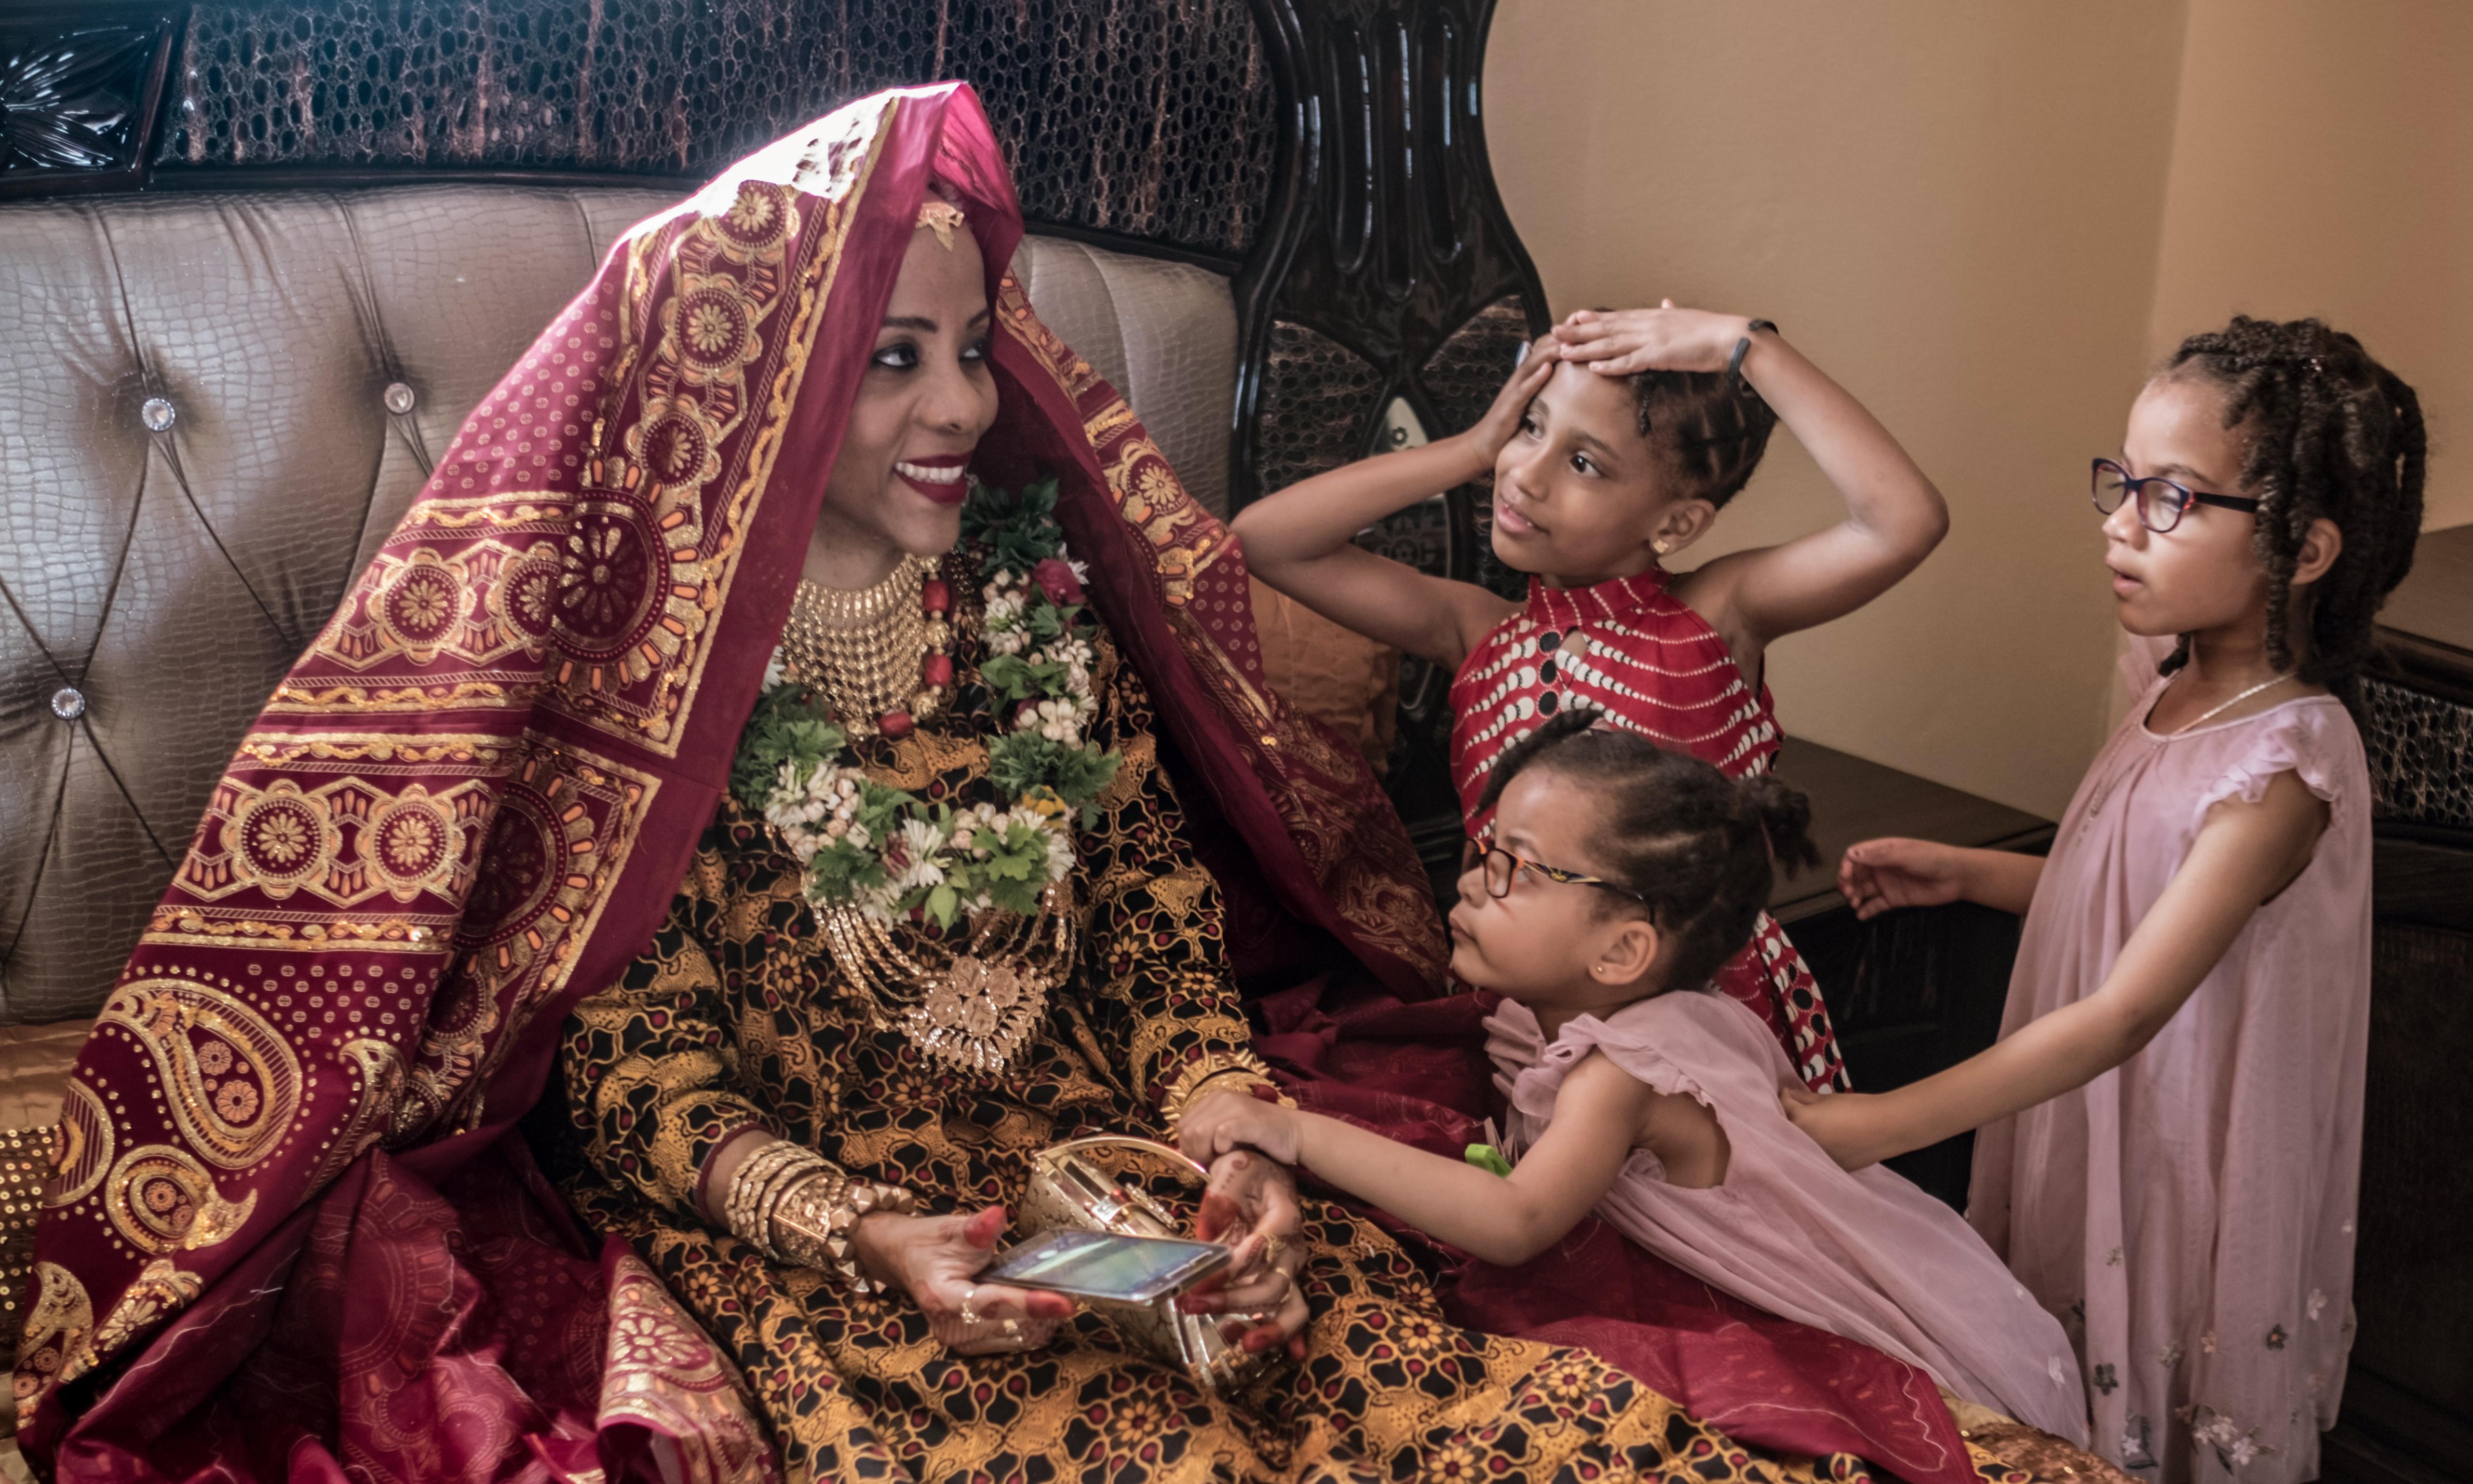 Bullfighting, dancing and spending big: a wedding in the Comoros – photo essay